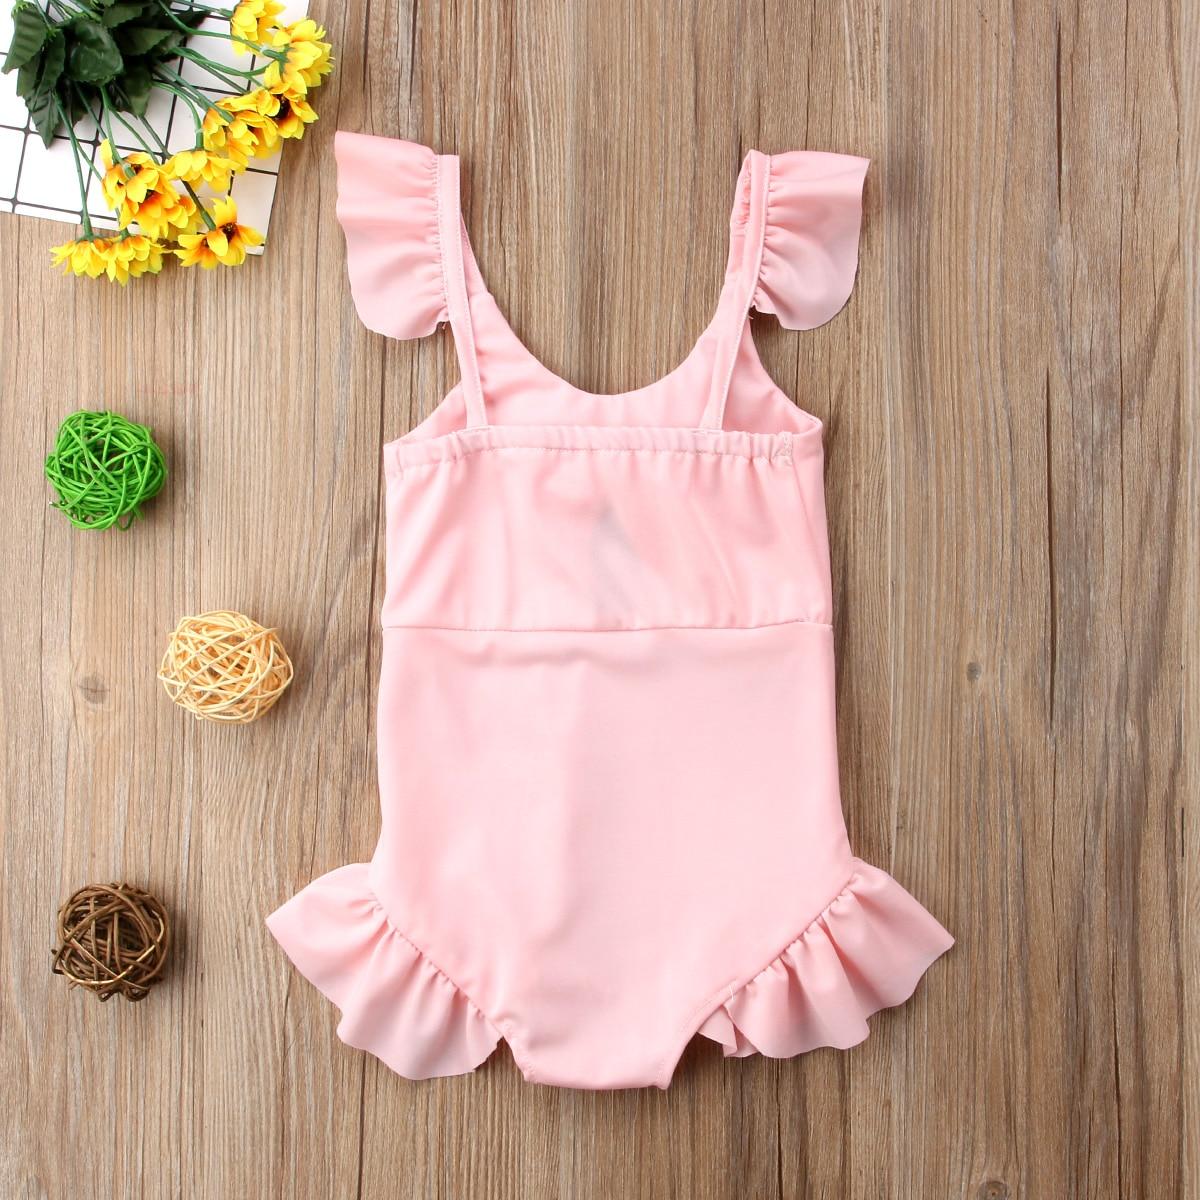 2018 Brand New Toddler Infant Kids Girls Bikini Swimwear Bathing